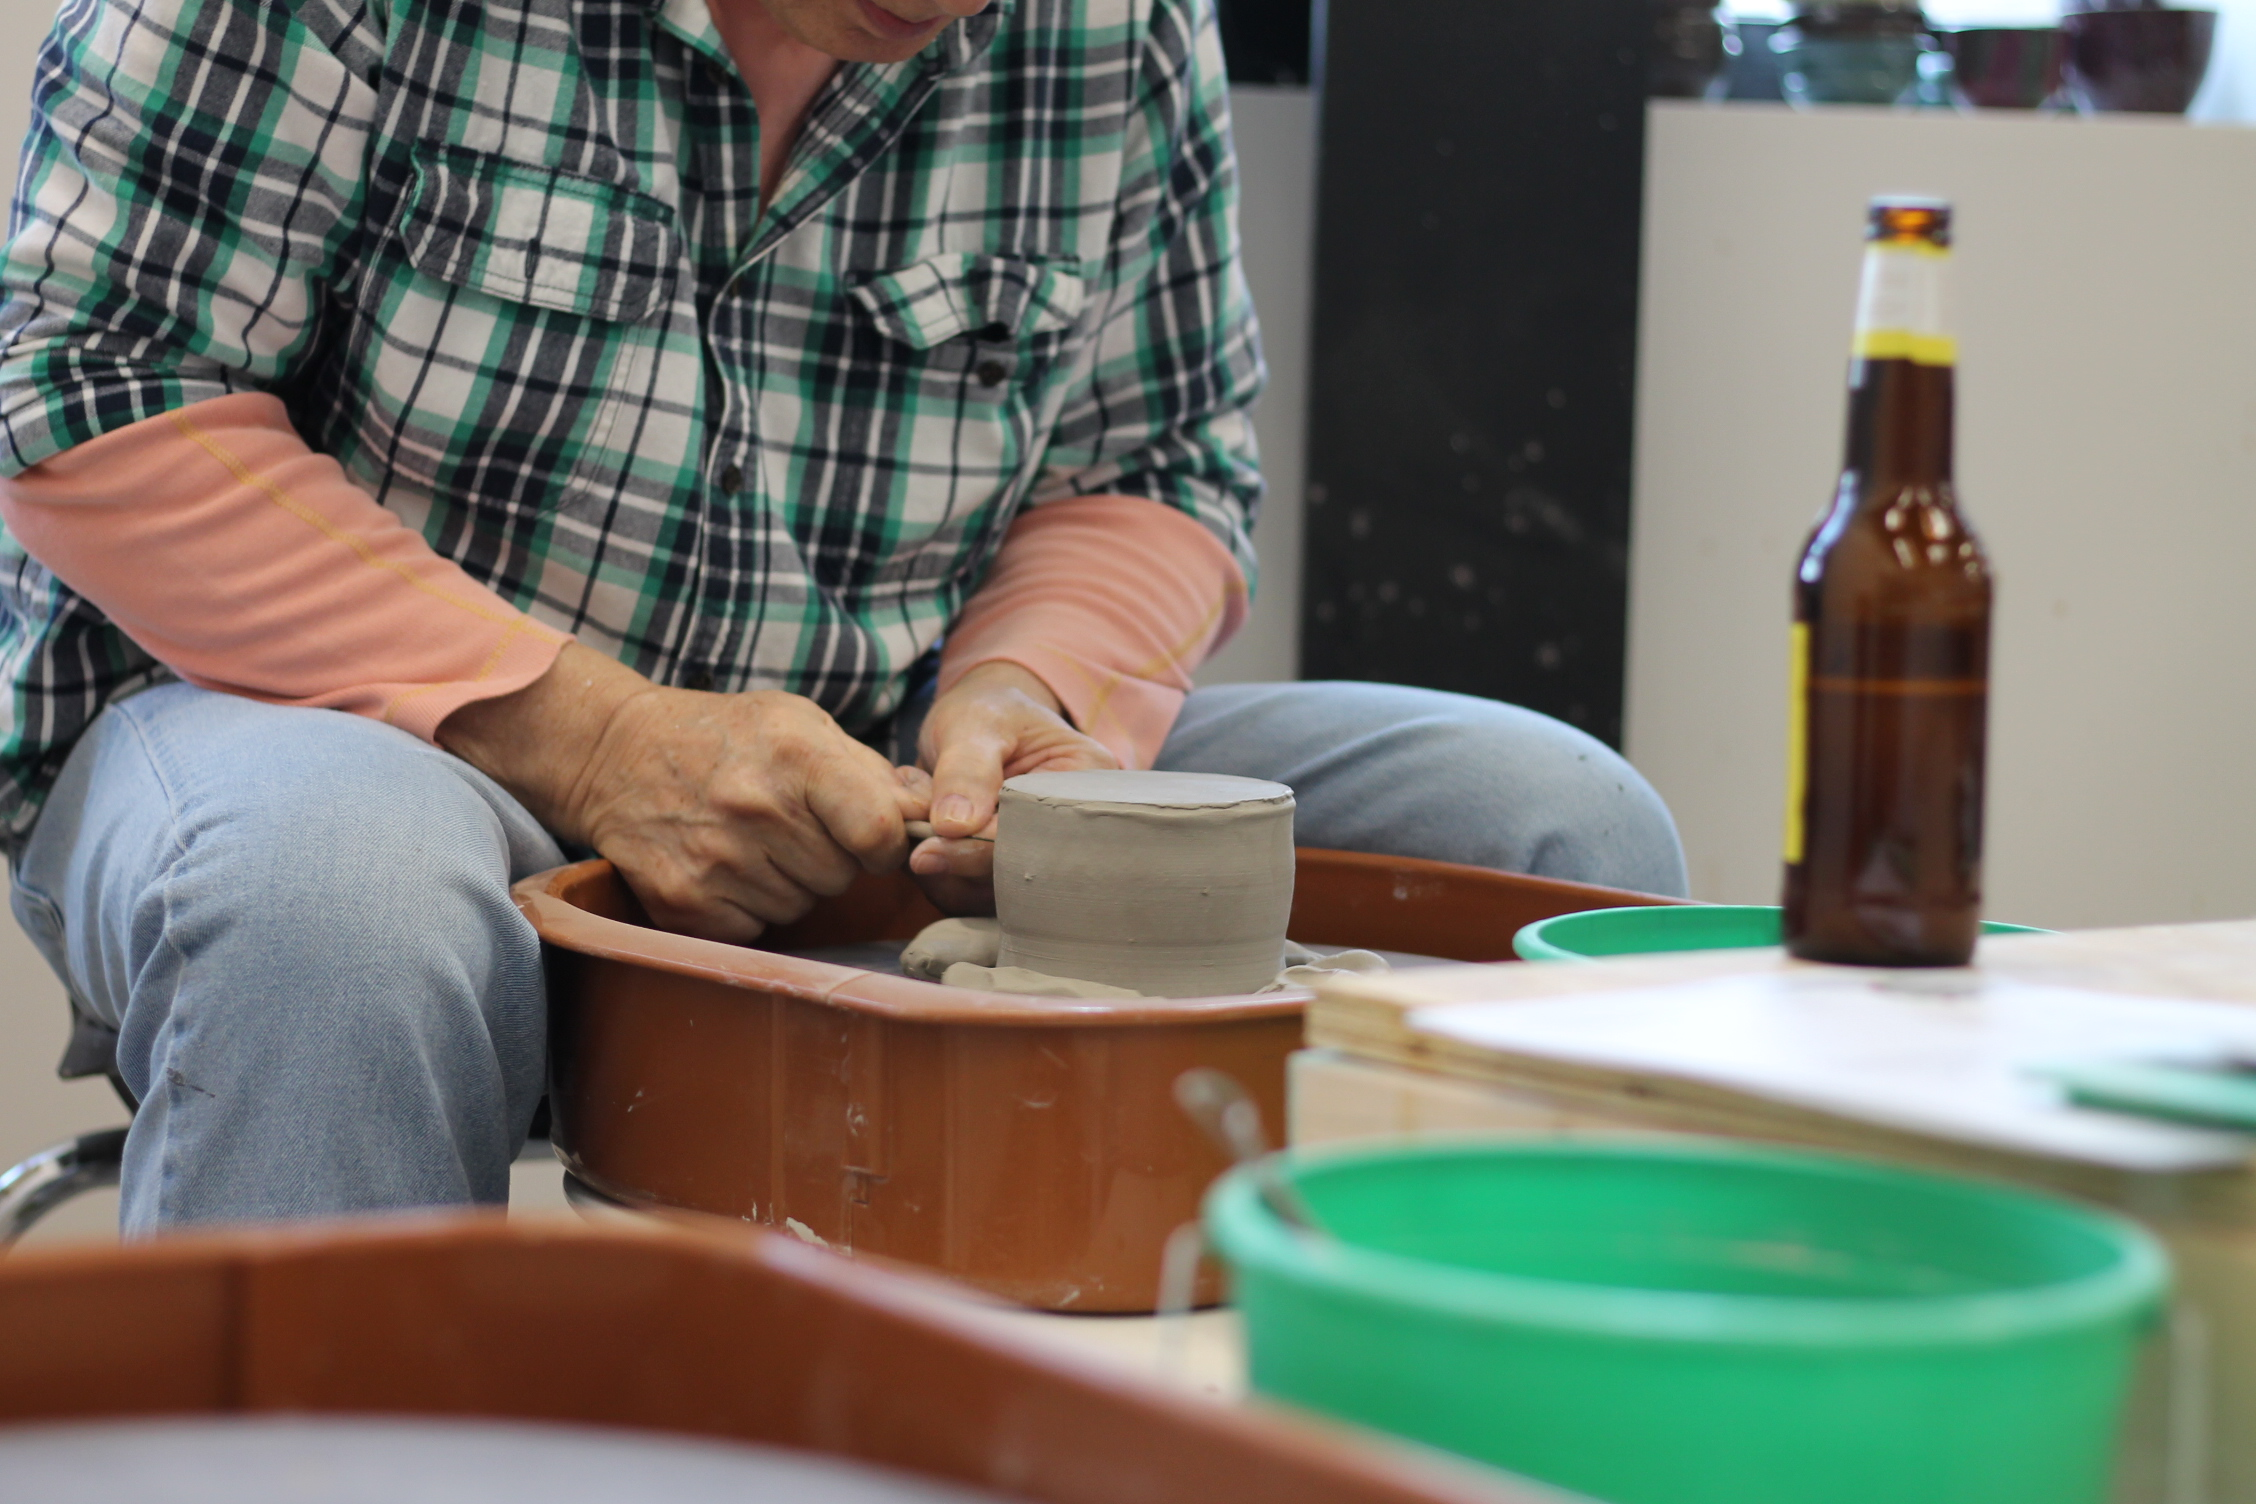 pottery student on wheel.JPG